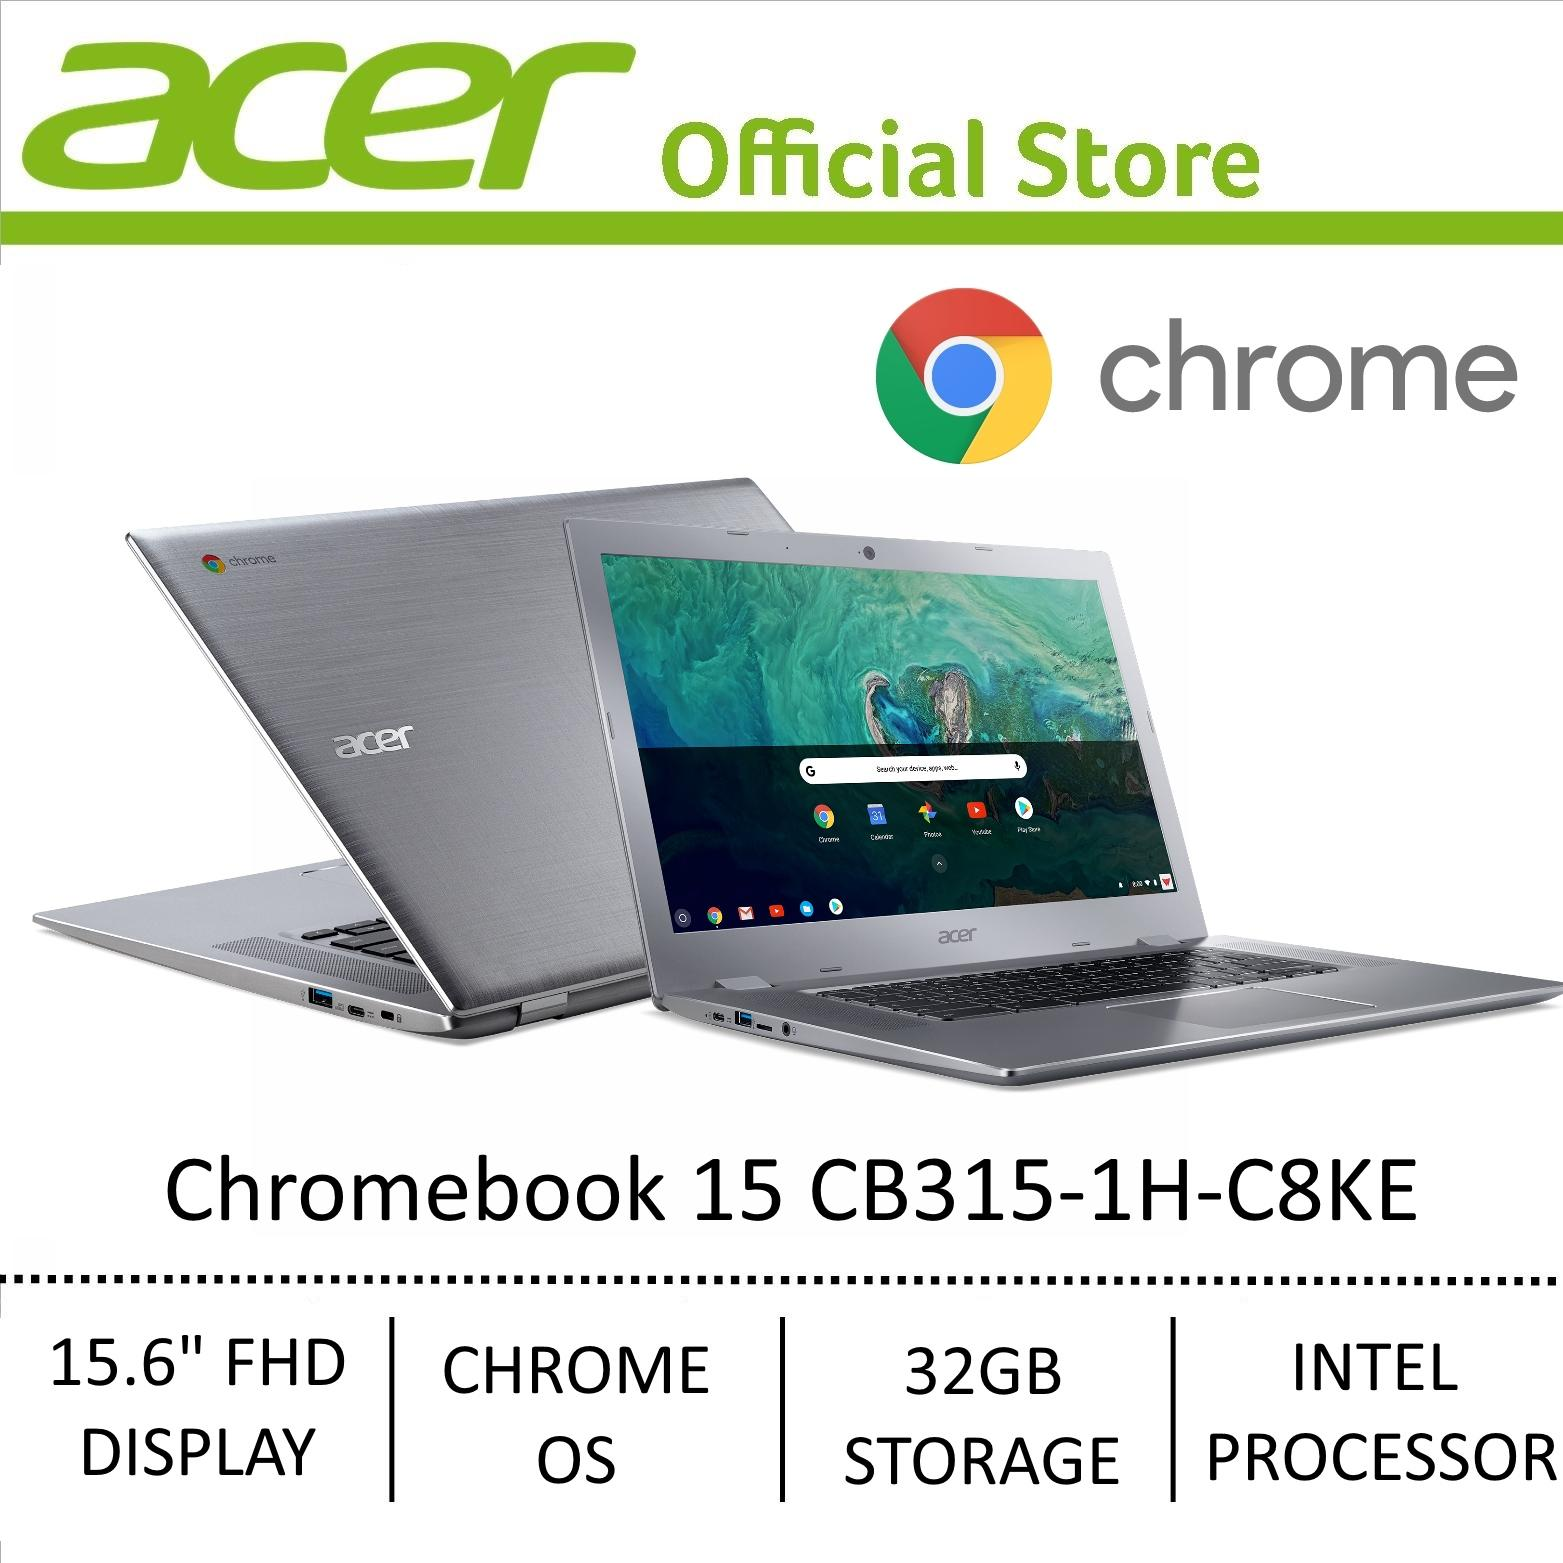 Acer Chromebook 15 Cb315-1h-C8ke By Acer Official Store.